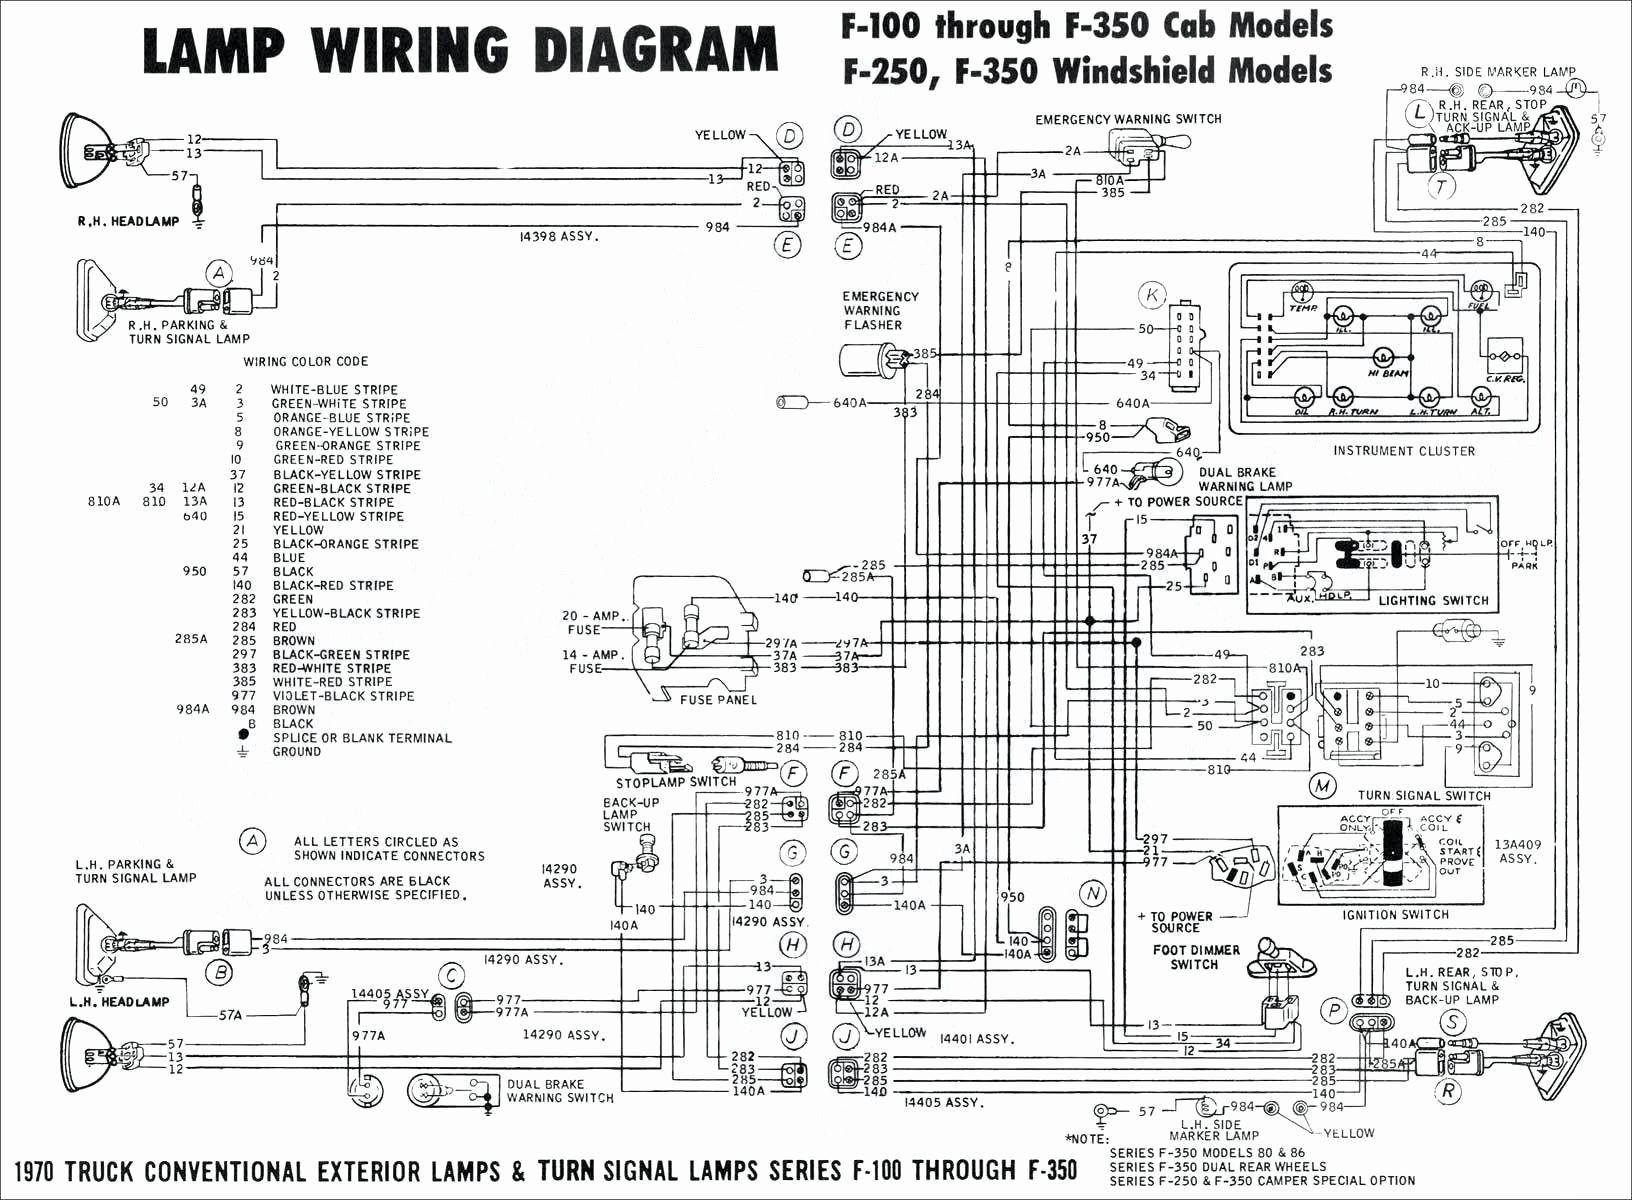 Diagram John Deere 4020 Fuel Guage Wiring Diagram Full Version Hd Quality Wiring Diagram Fine Diagram Biorygen It